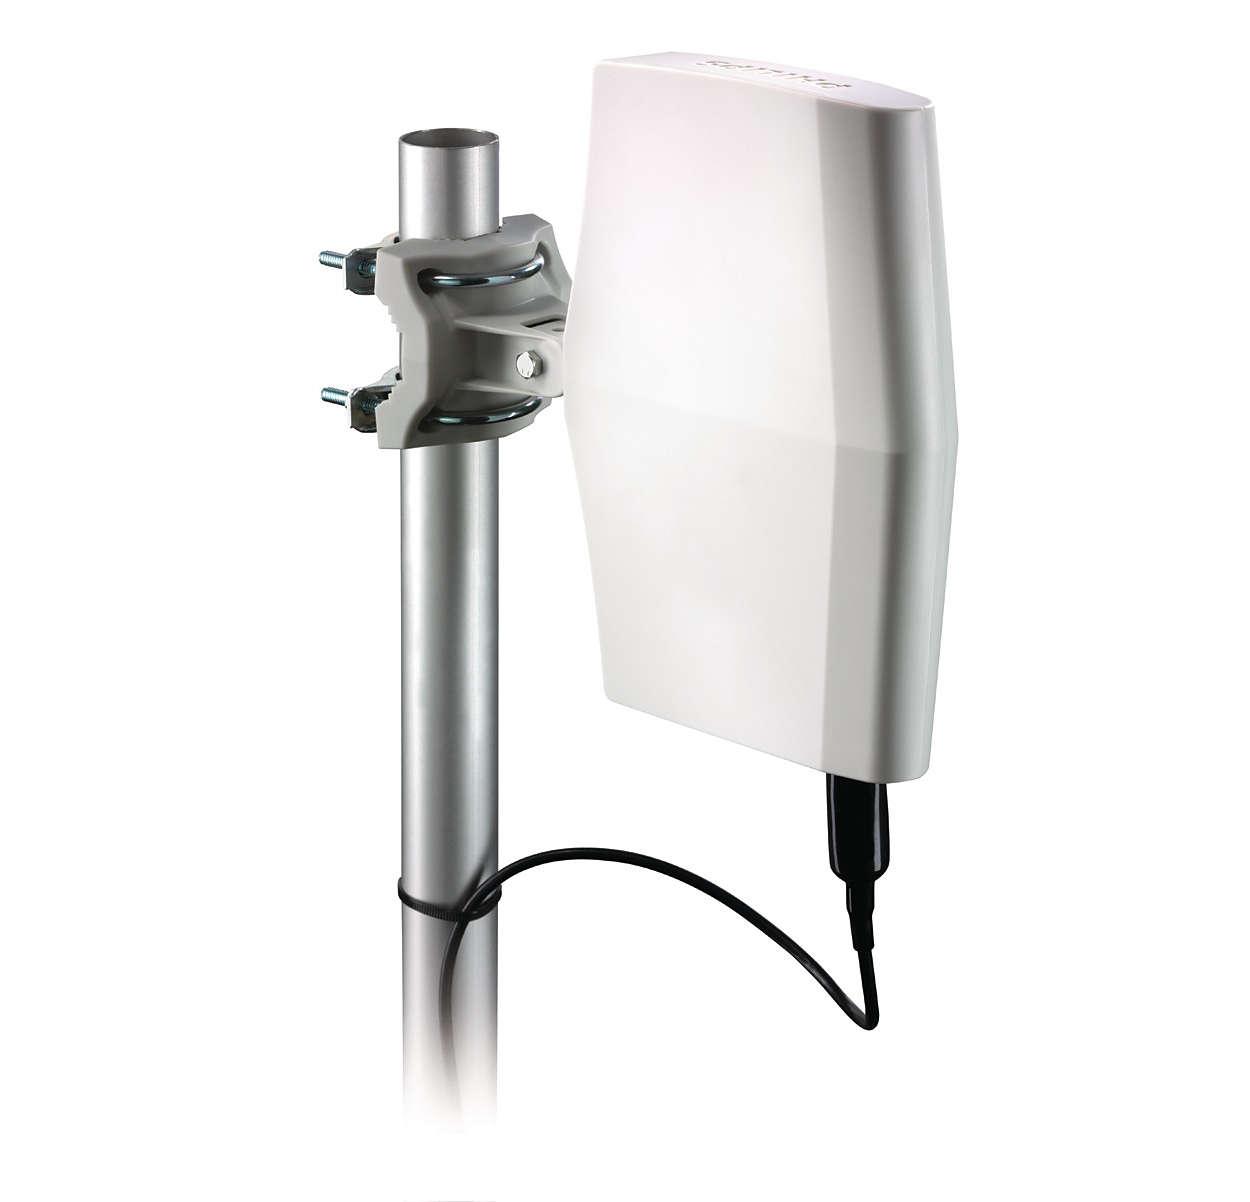 digital tv antenna sdv8622t 27 philips. Black Bedroom Furniture Sets. Home Design Ideas